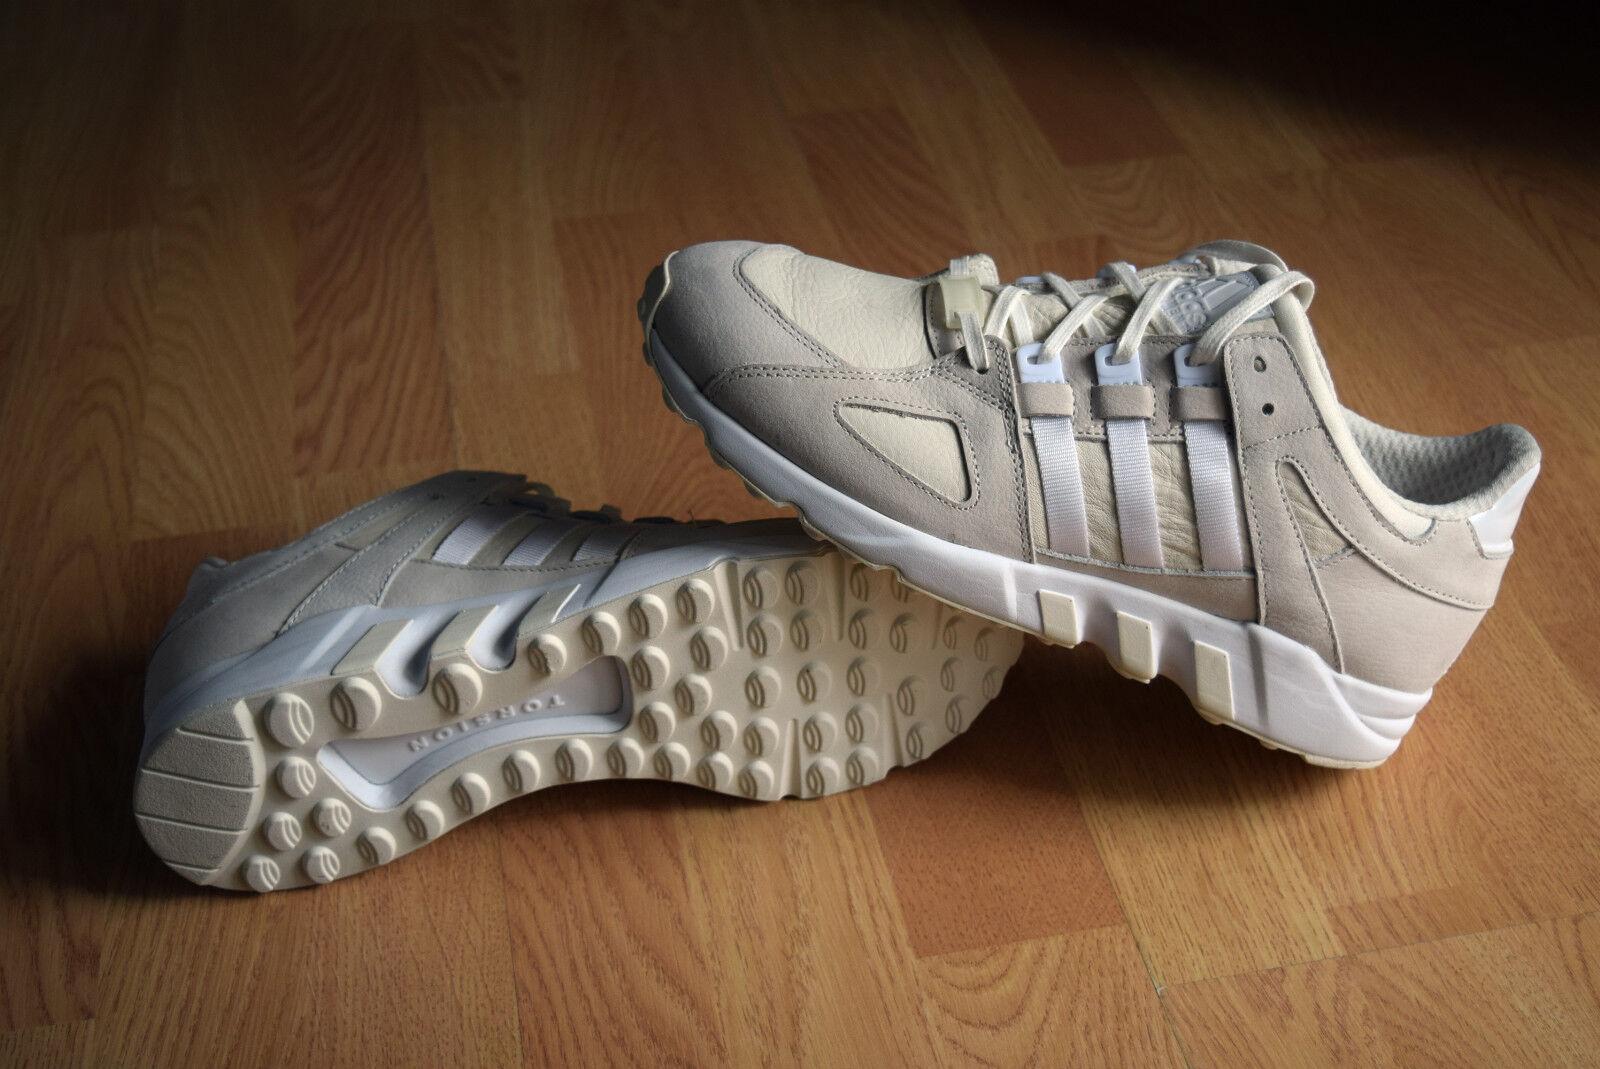 Adidas Equipment Guidance 93   40 41 42 43 44 45 46 47 46 48 49  B25296 Support